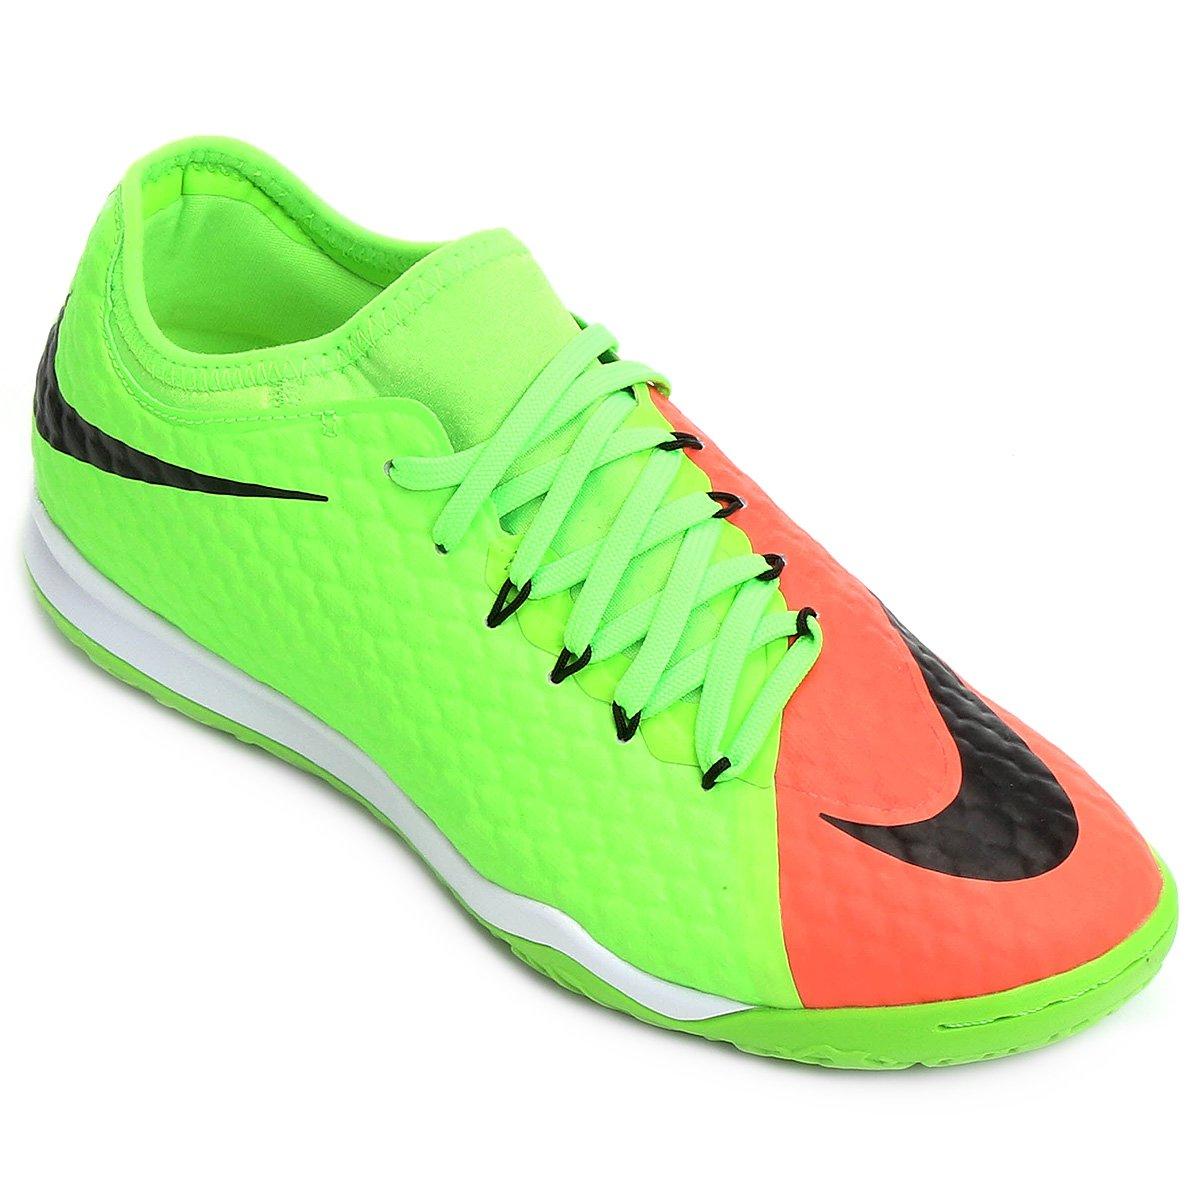 Chuteira Futsal Nike Hypervenom Finale 2 IC - Compre Agora  40f733266044a